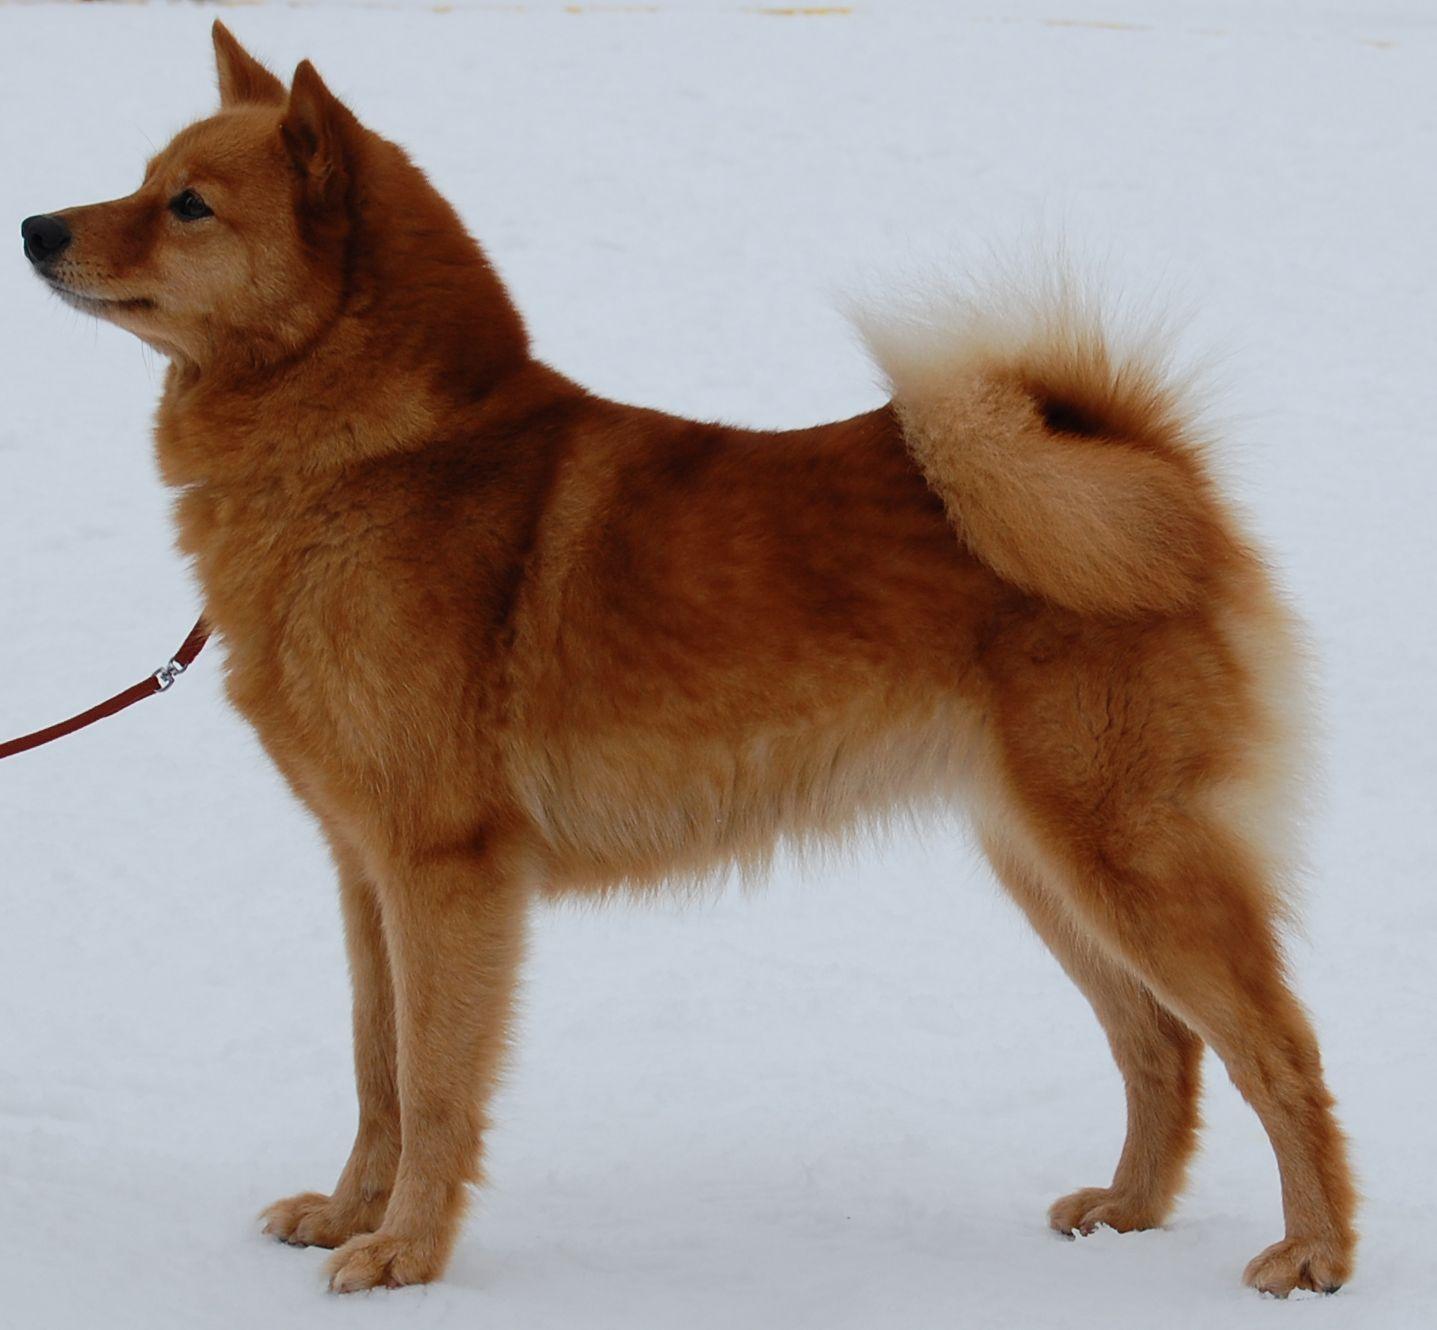 Pin By Pirjo Oittinen On Dog Finnish Spitz Spitz Dogs Swedish Vallhund